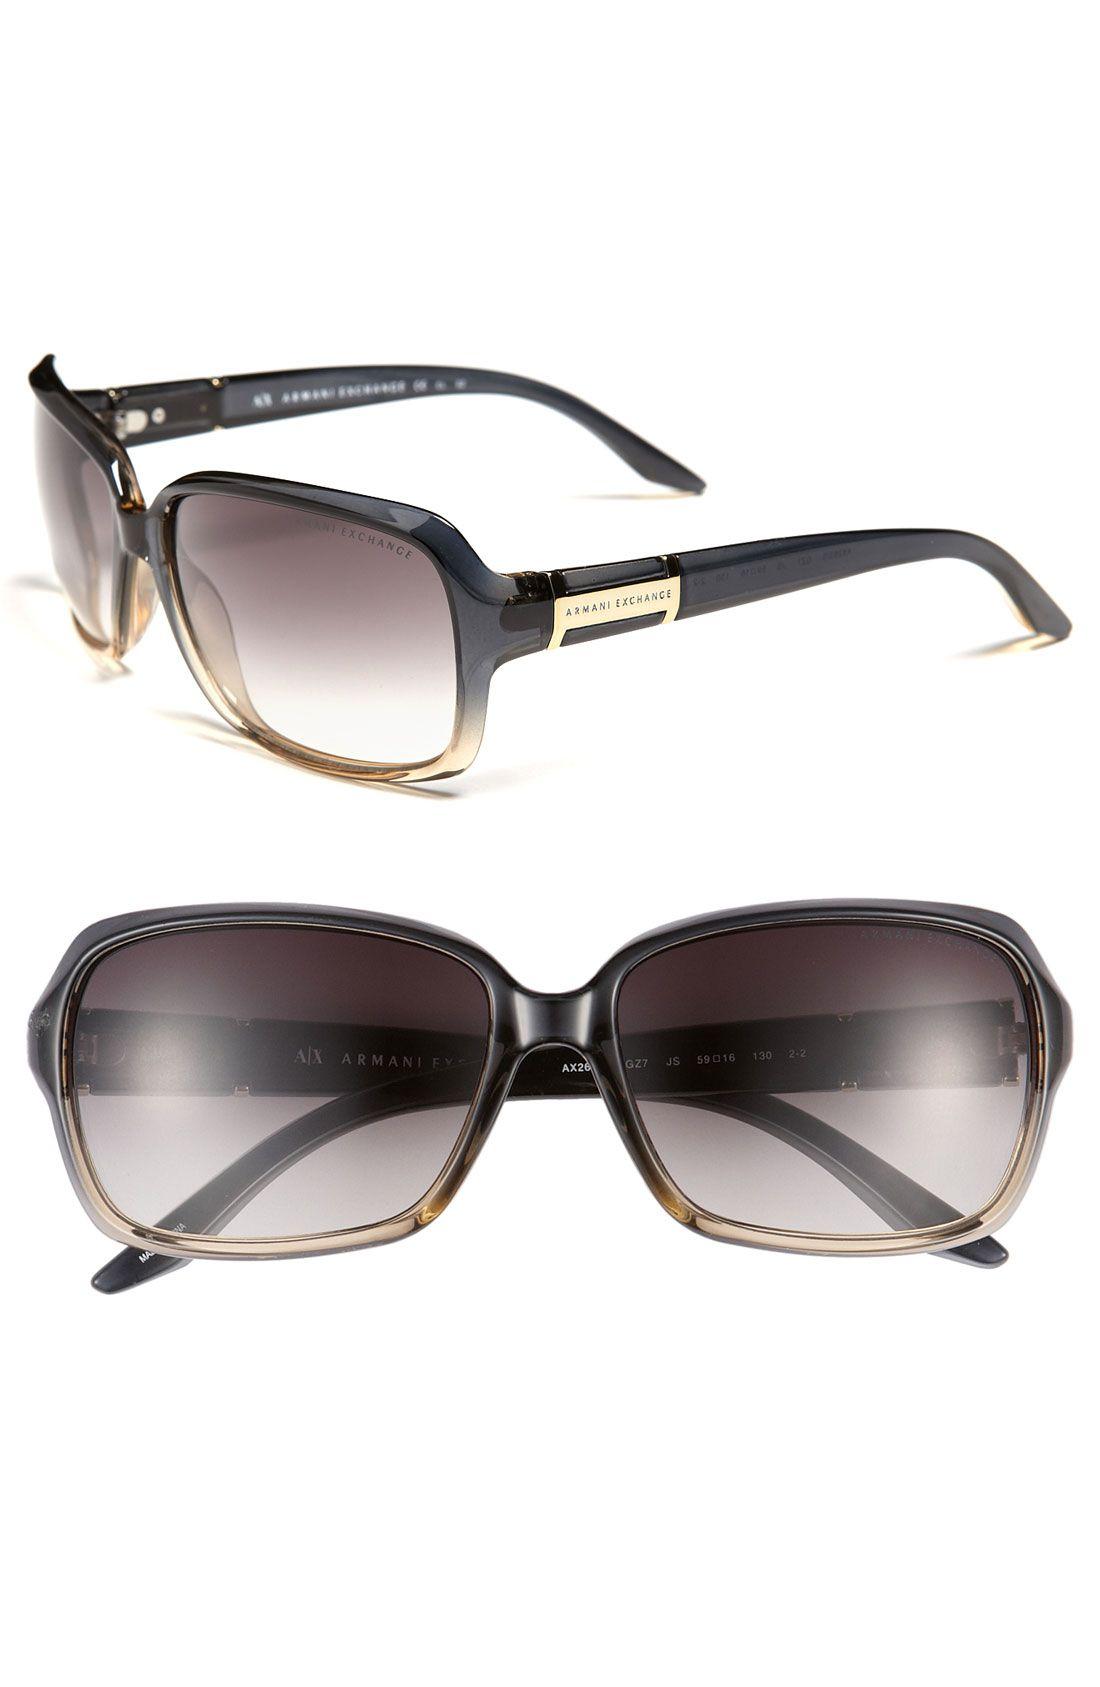 d8c5faf130e69 AX Armani Exchange Sunglasses